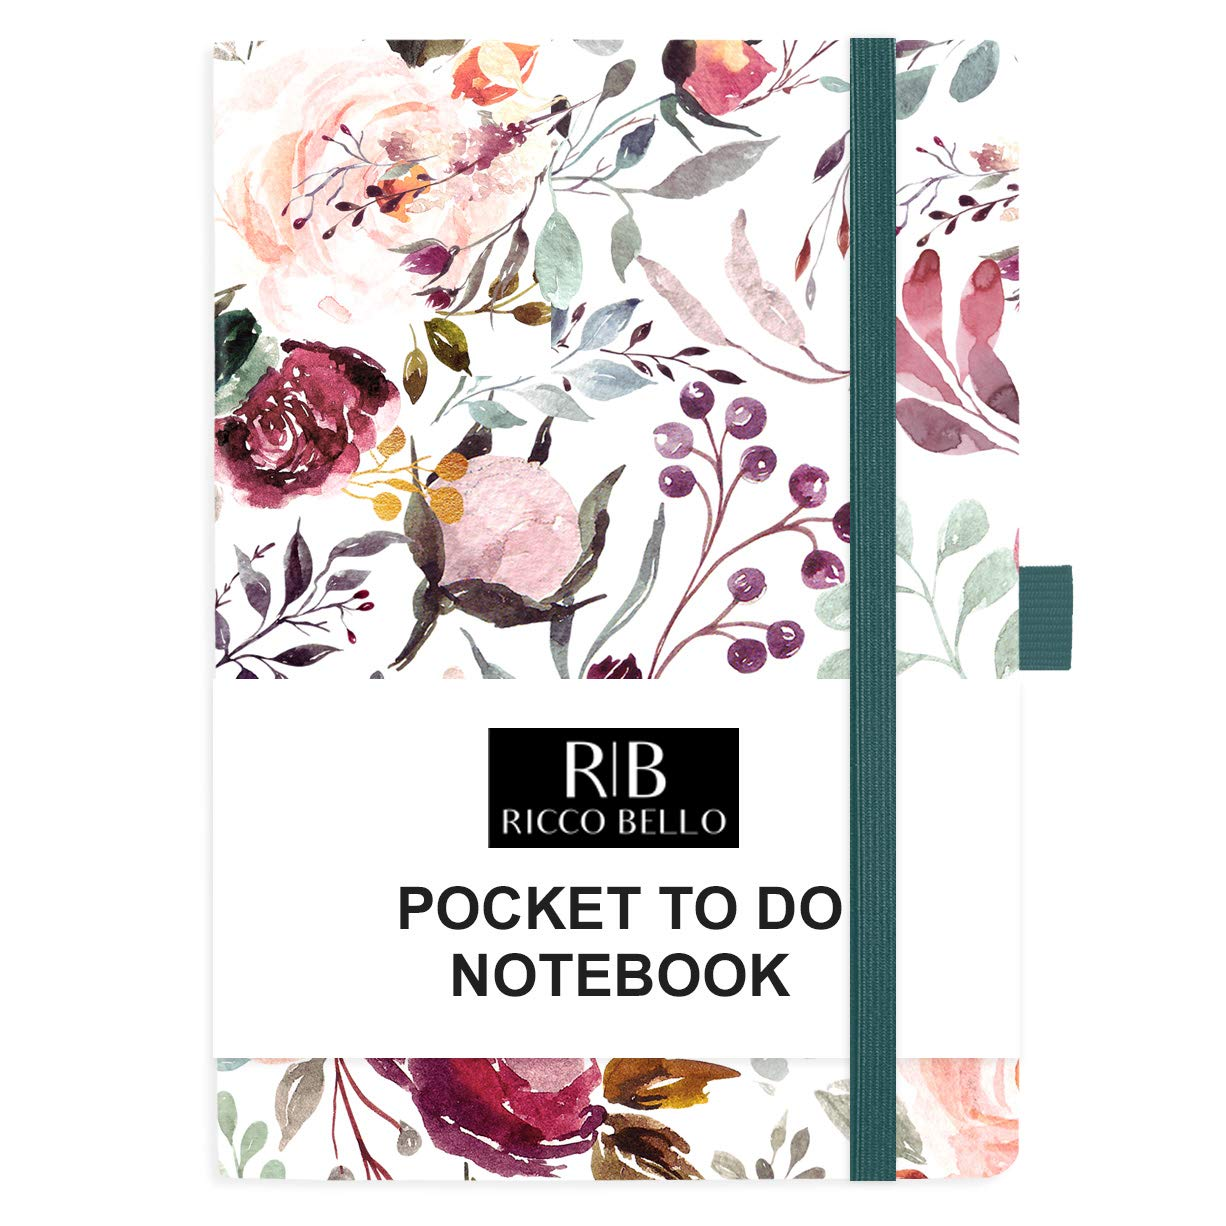 RICCO BELLO Small Hardcover Pocket to Do List Notebook, Elastic Band Closure, Pen Loop, Ribbon Bookmark, Storage Pocket, 4.25 x 6 inches (Blossoms)